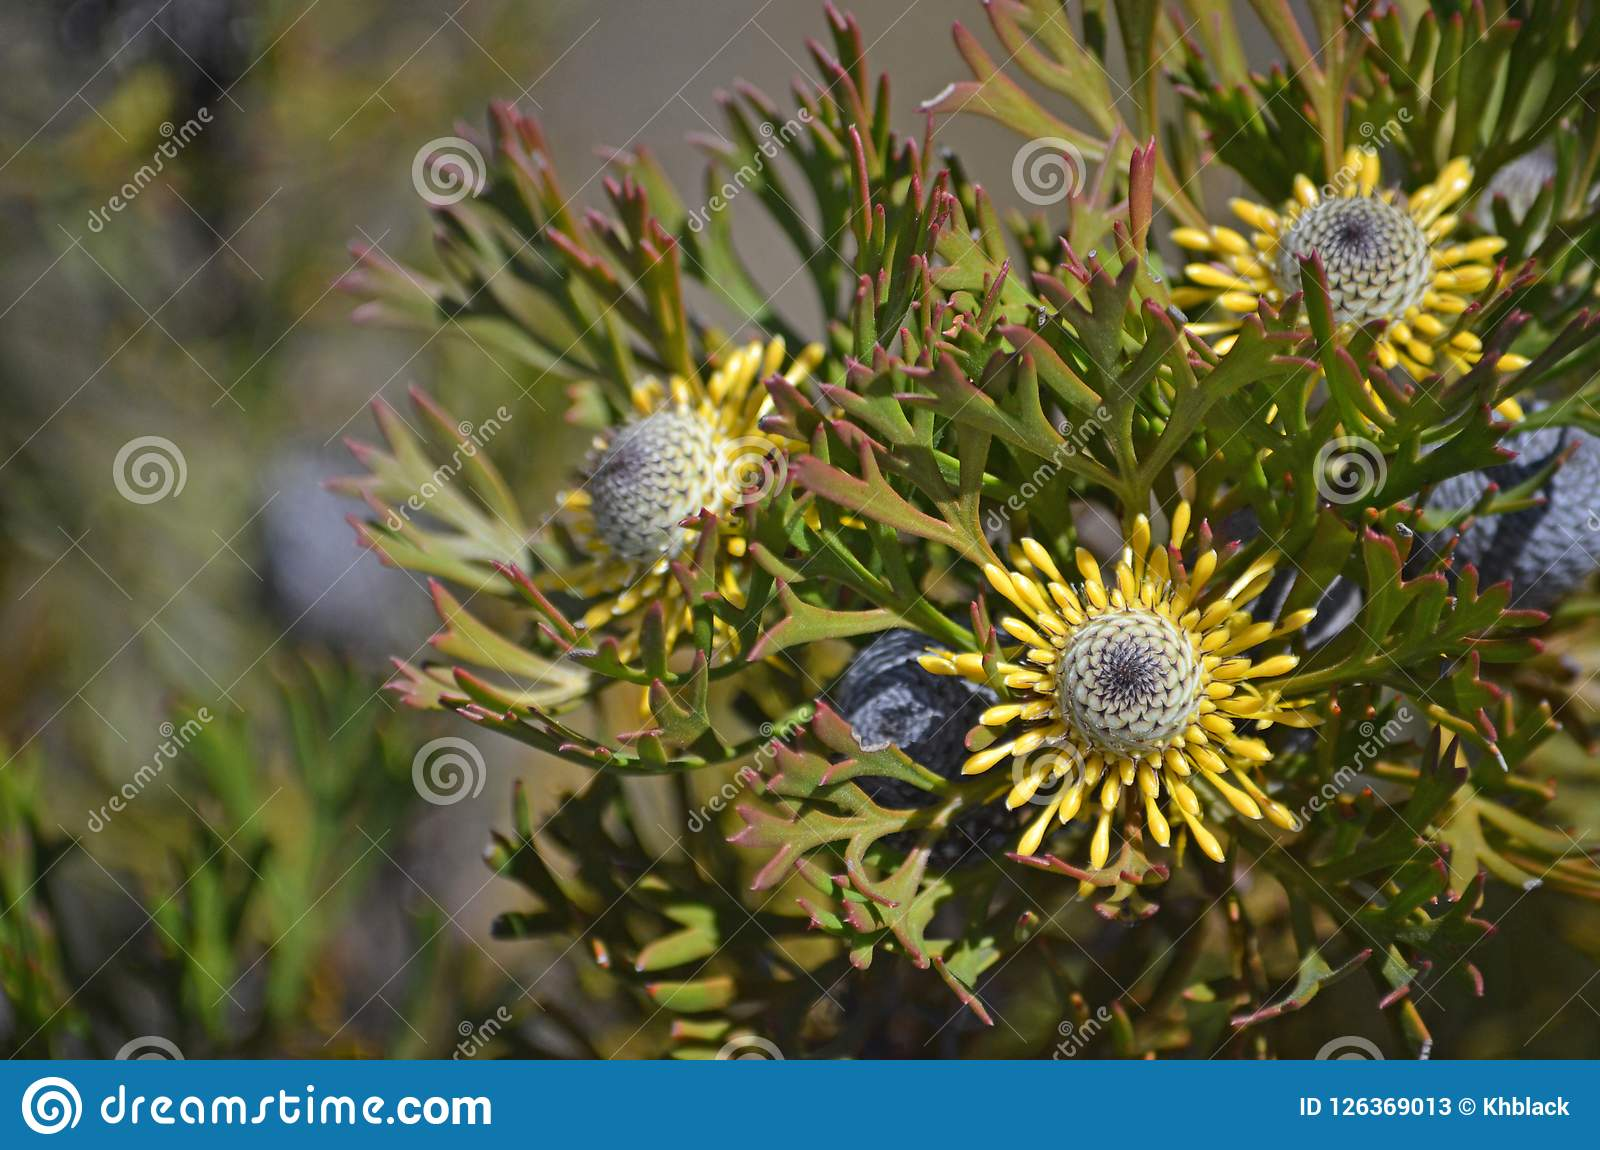 Yellow australian native broad leaf drumstick flowers stock image download yellow australian native broad leaf drumstick flowers stock image image of anemonifolius mightylinksfo